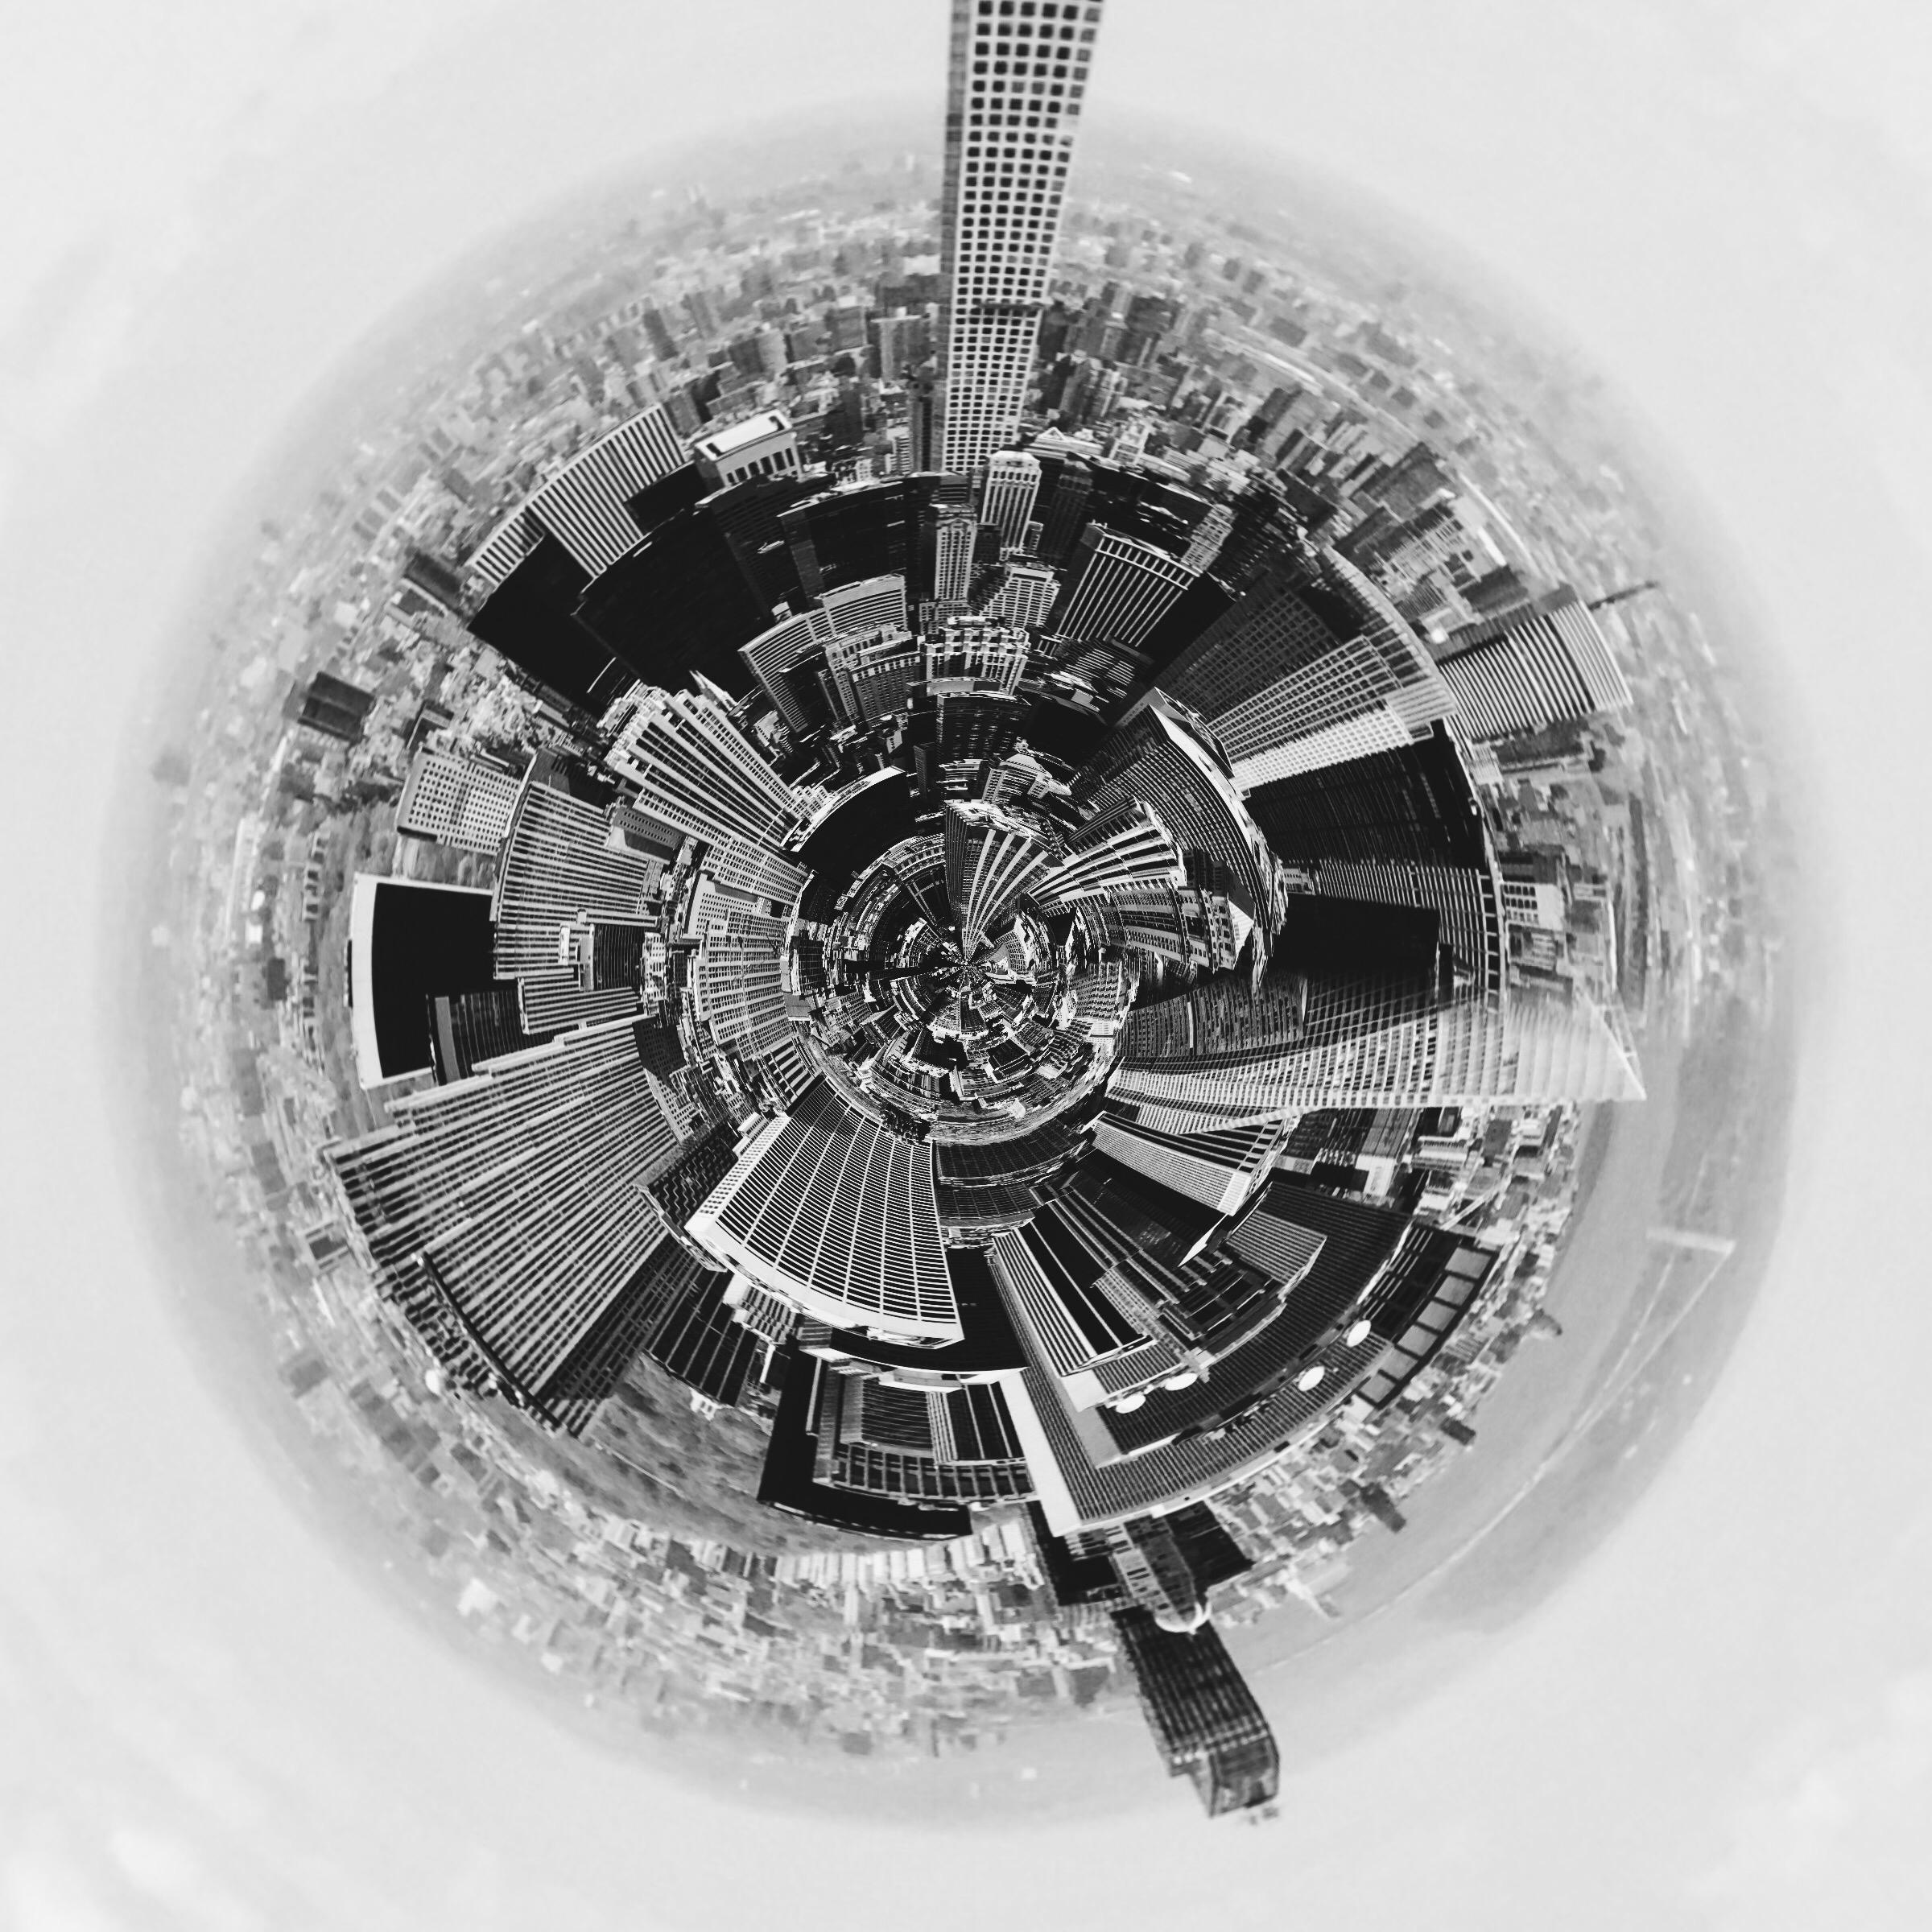 mmshop-city2-3.jpg